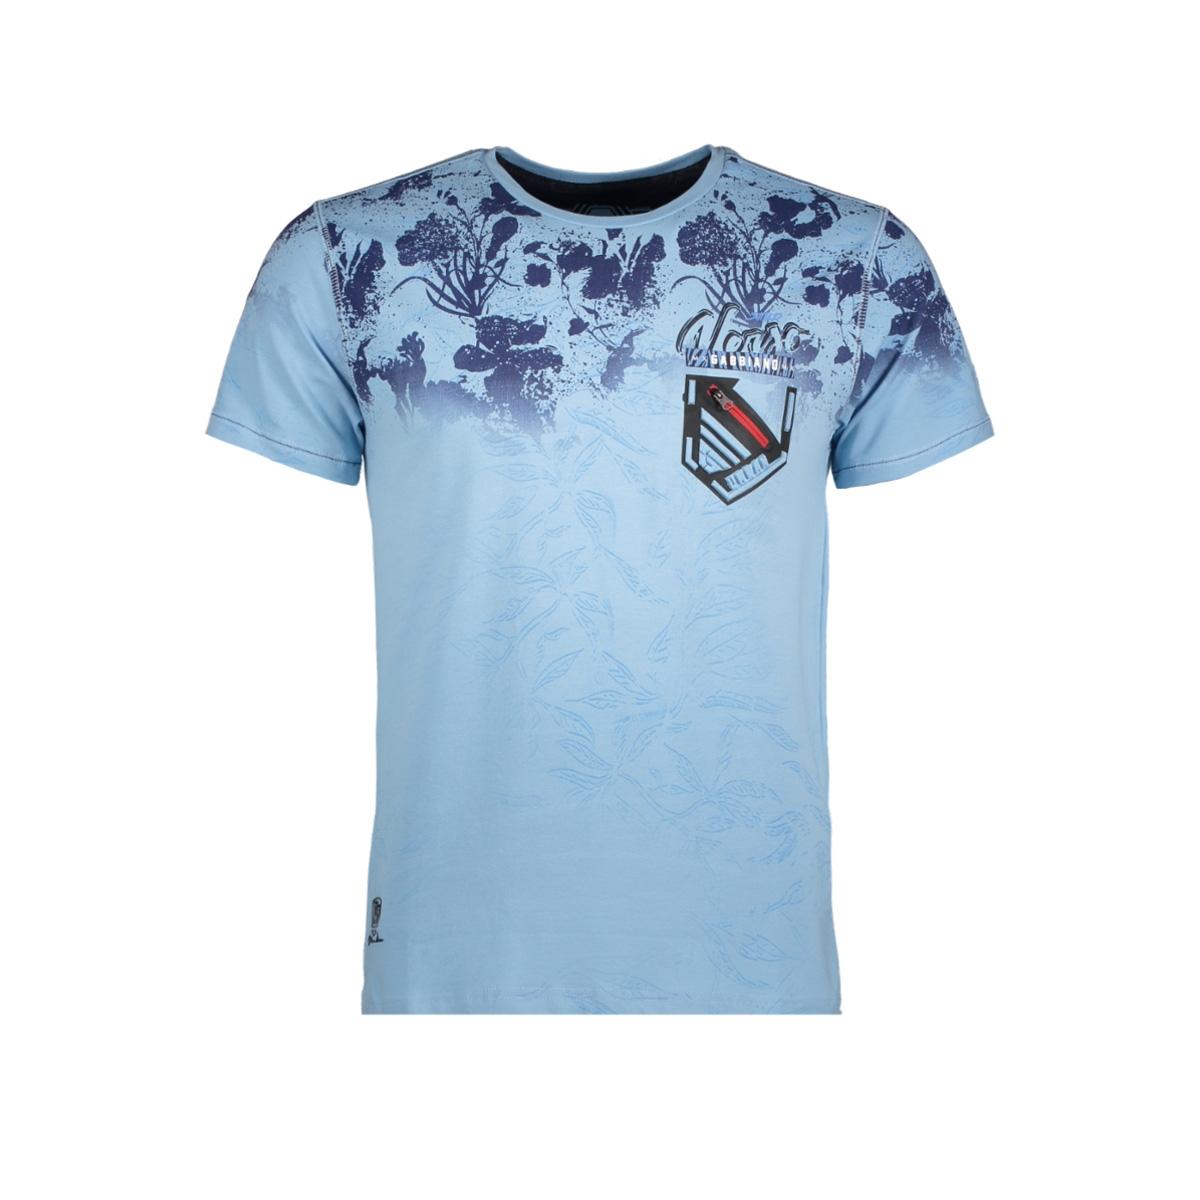 13895 gabbiano t-shirt light blue